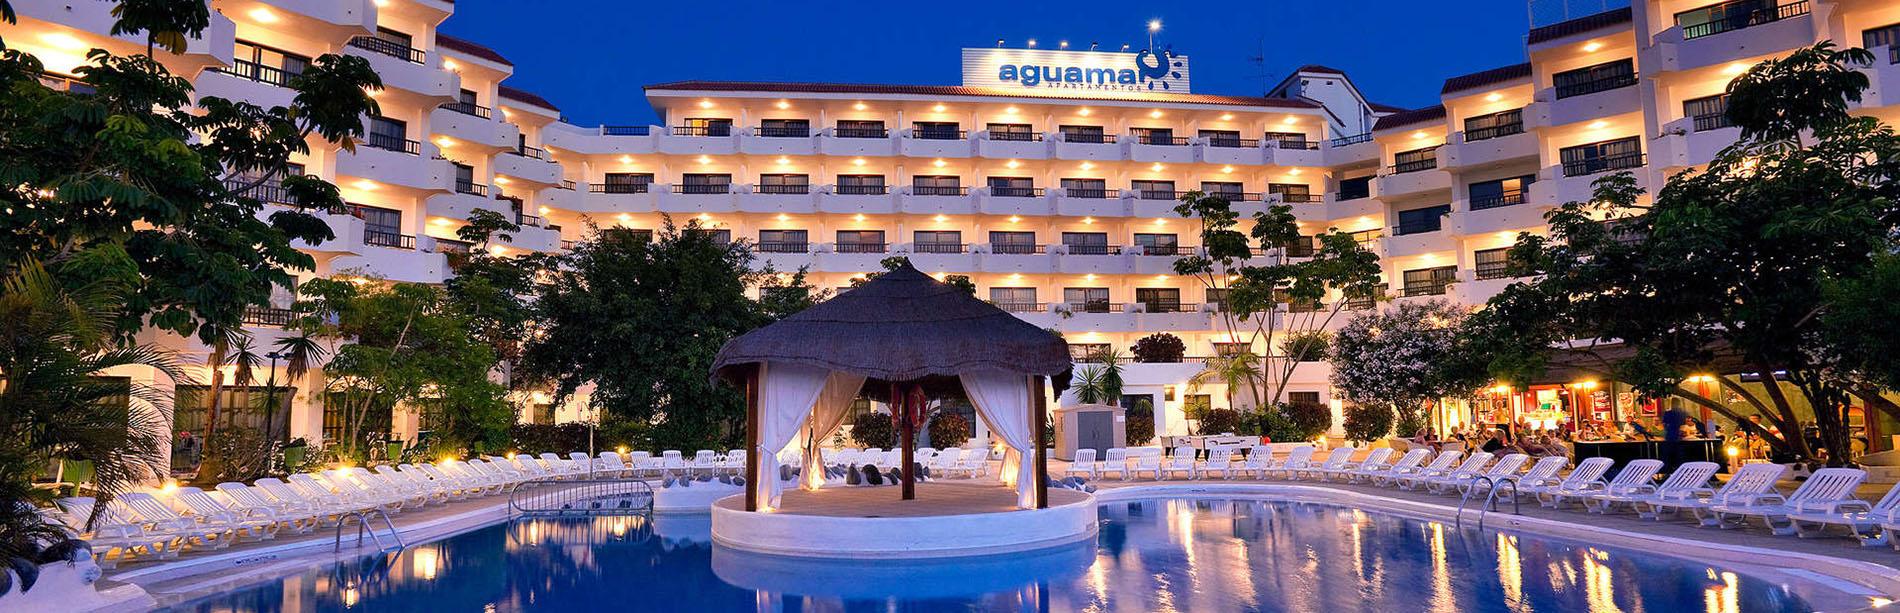 Aguamar Apartments, Tenerife